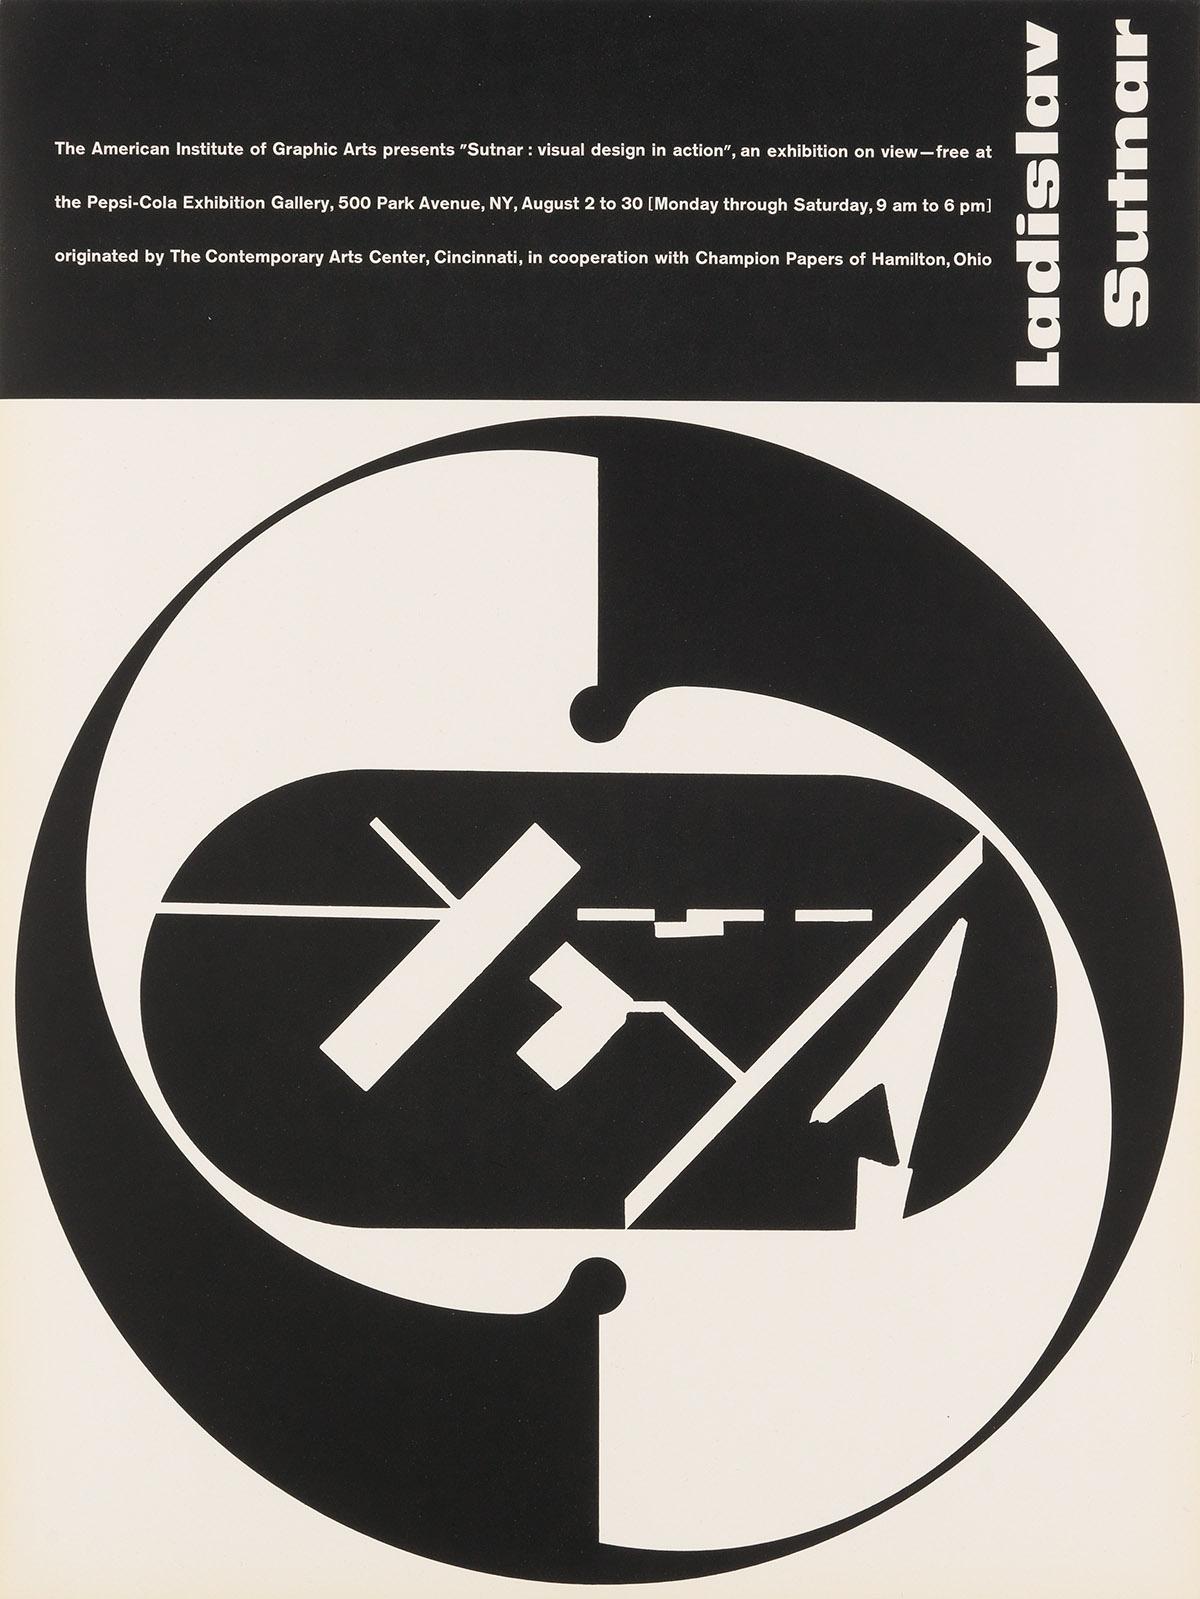 NOEL-MARTIN-(1922-2009)-LADISLAV-SUTNAR--VISUAL-DESIGN-IN-AC